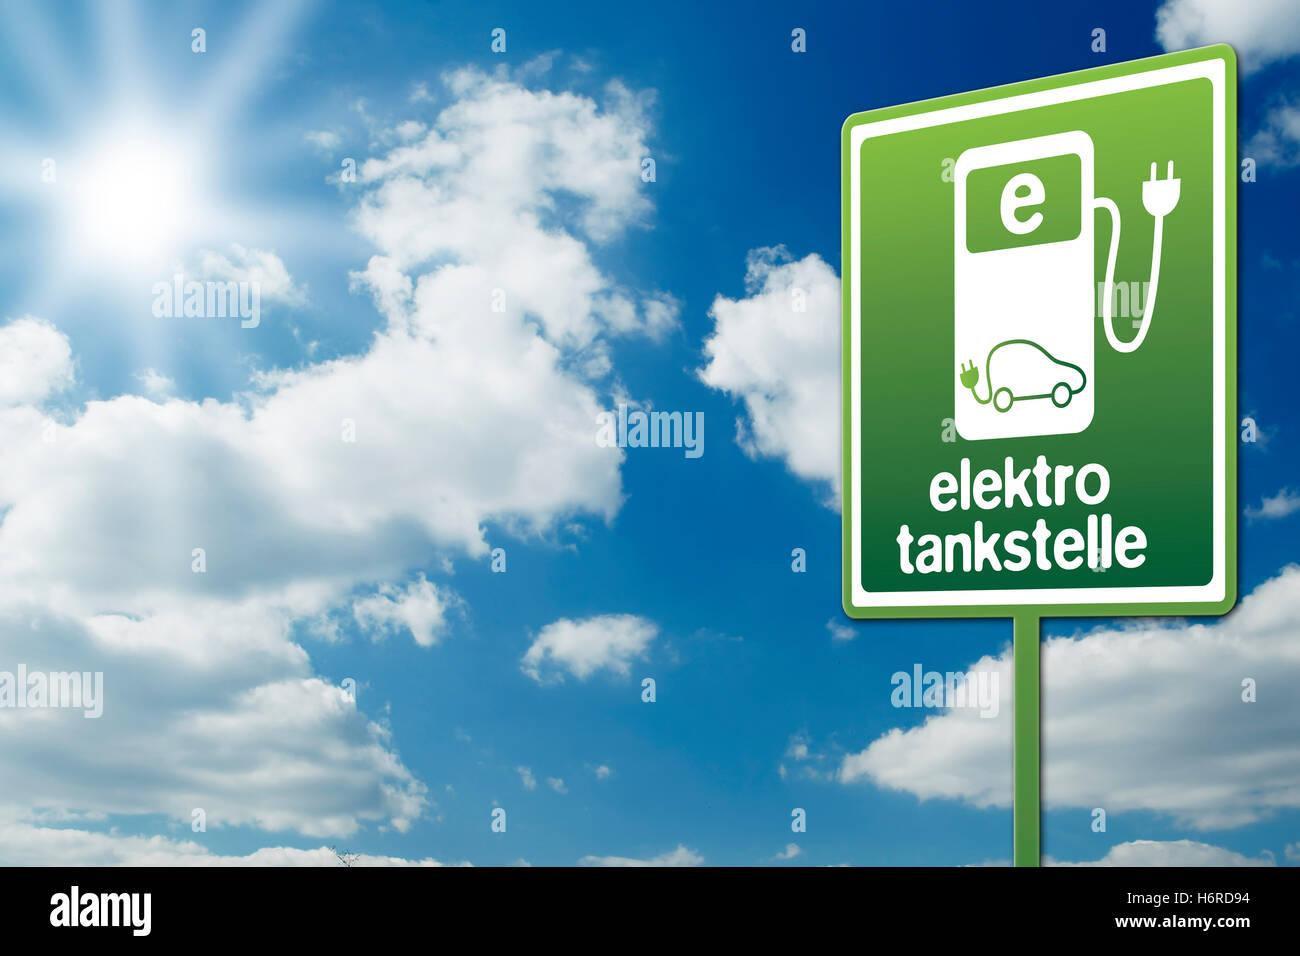 elektrotankstelle Stock Photo